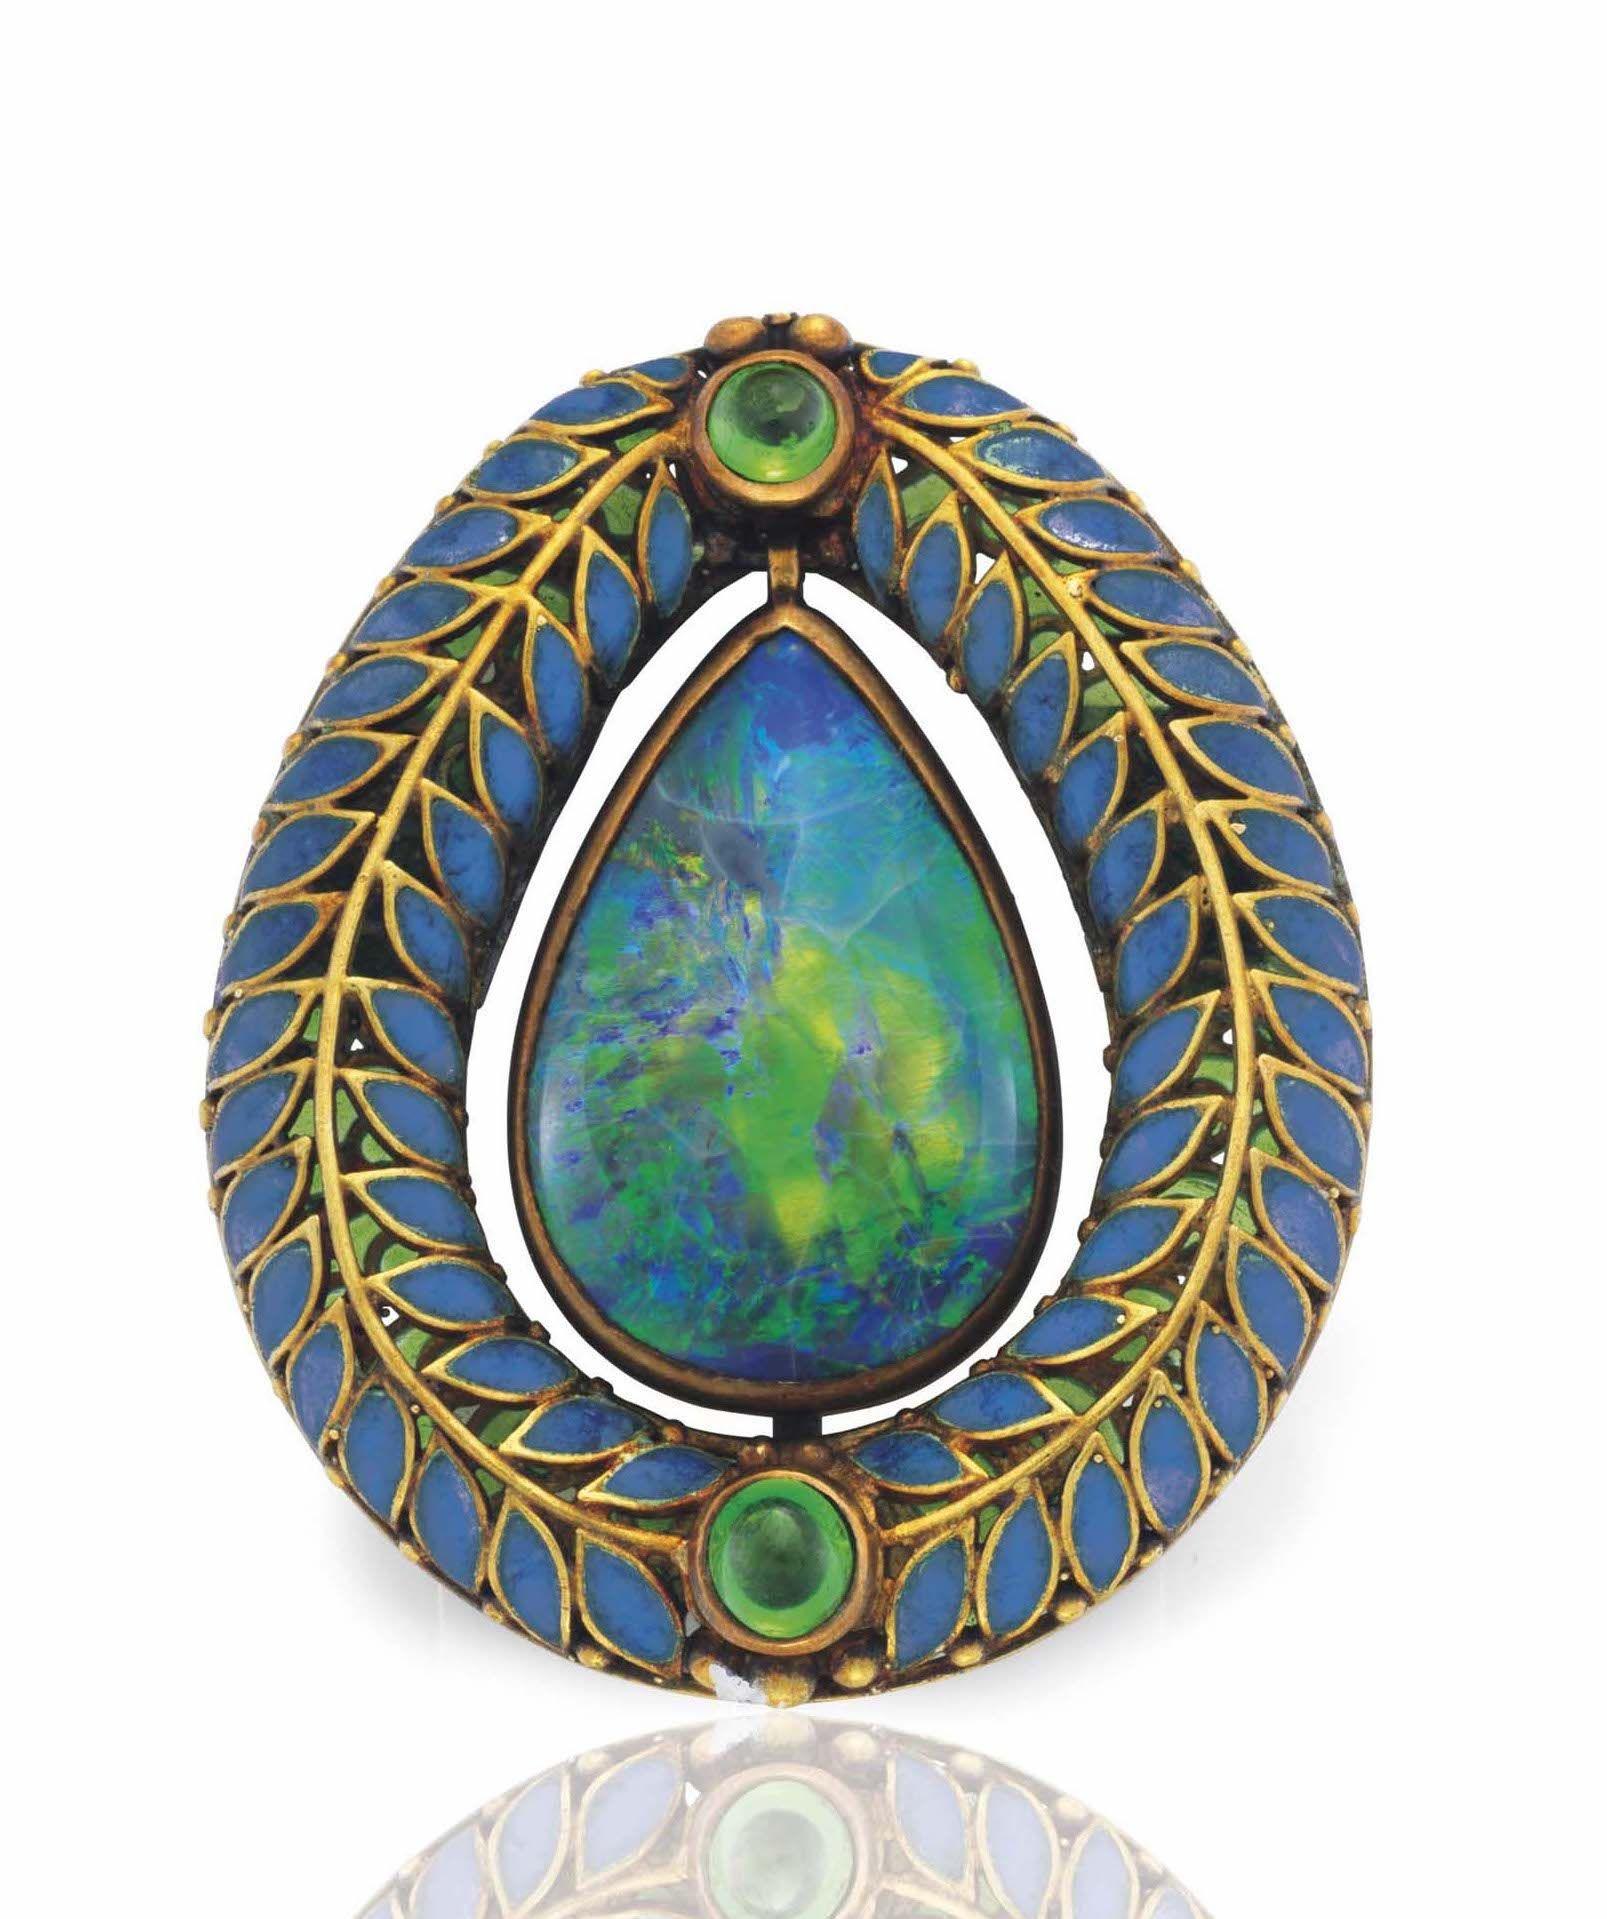 8790a0f9a Christies Sale 14760 Lot 151 A Black Opal, Demantoid Garnet And Enamel  Brooch